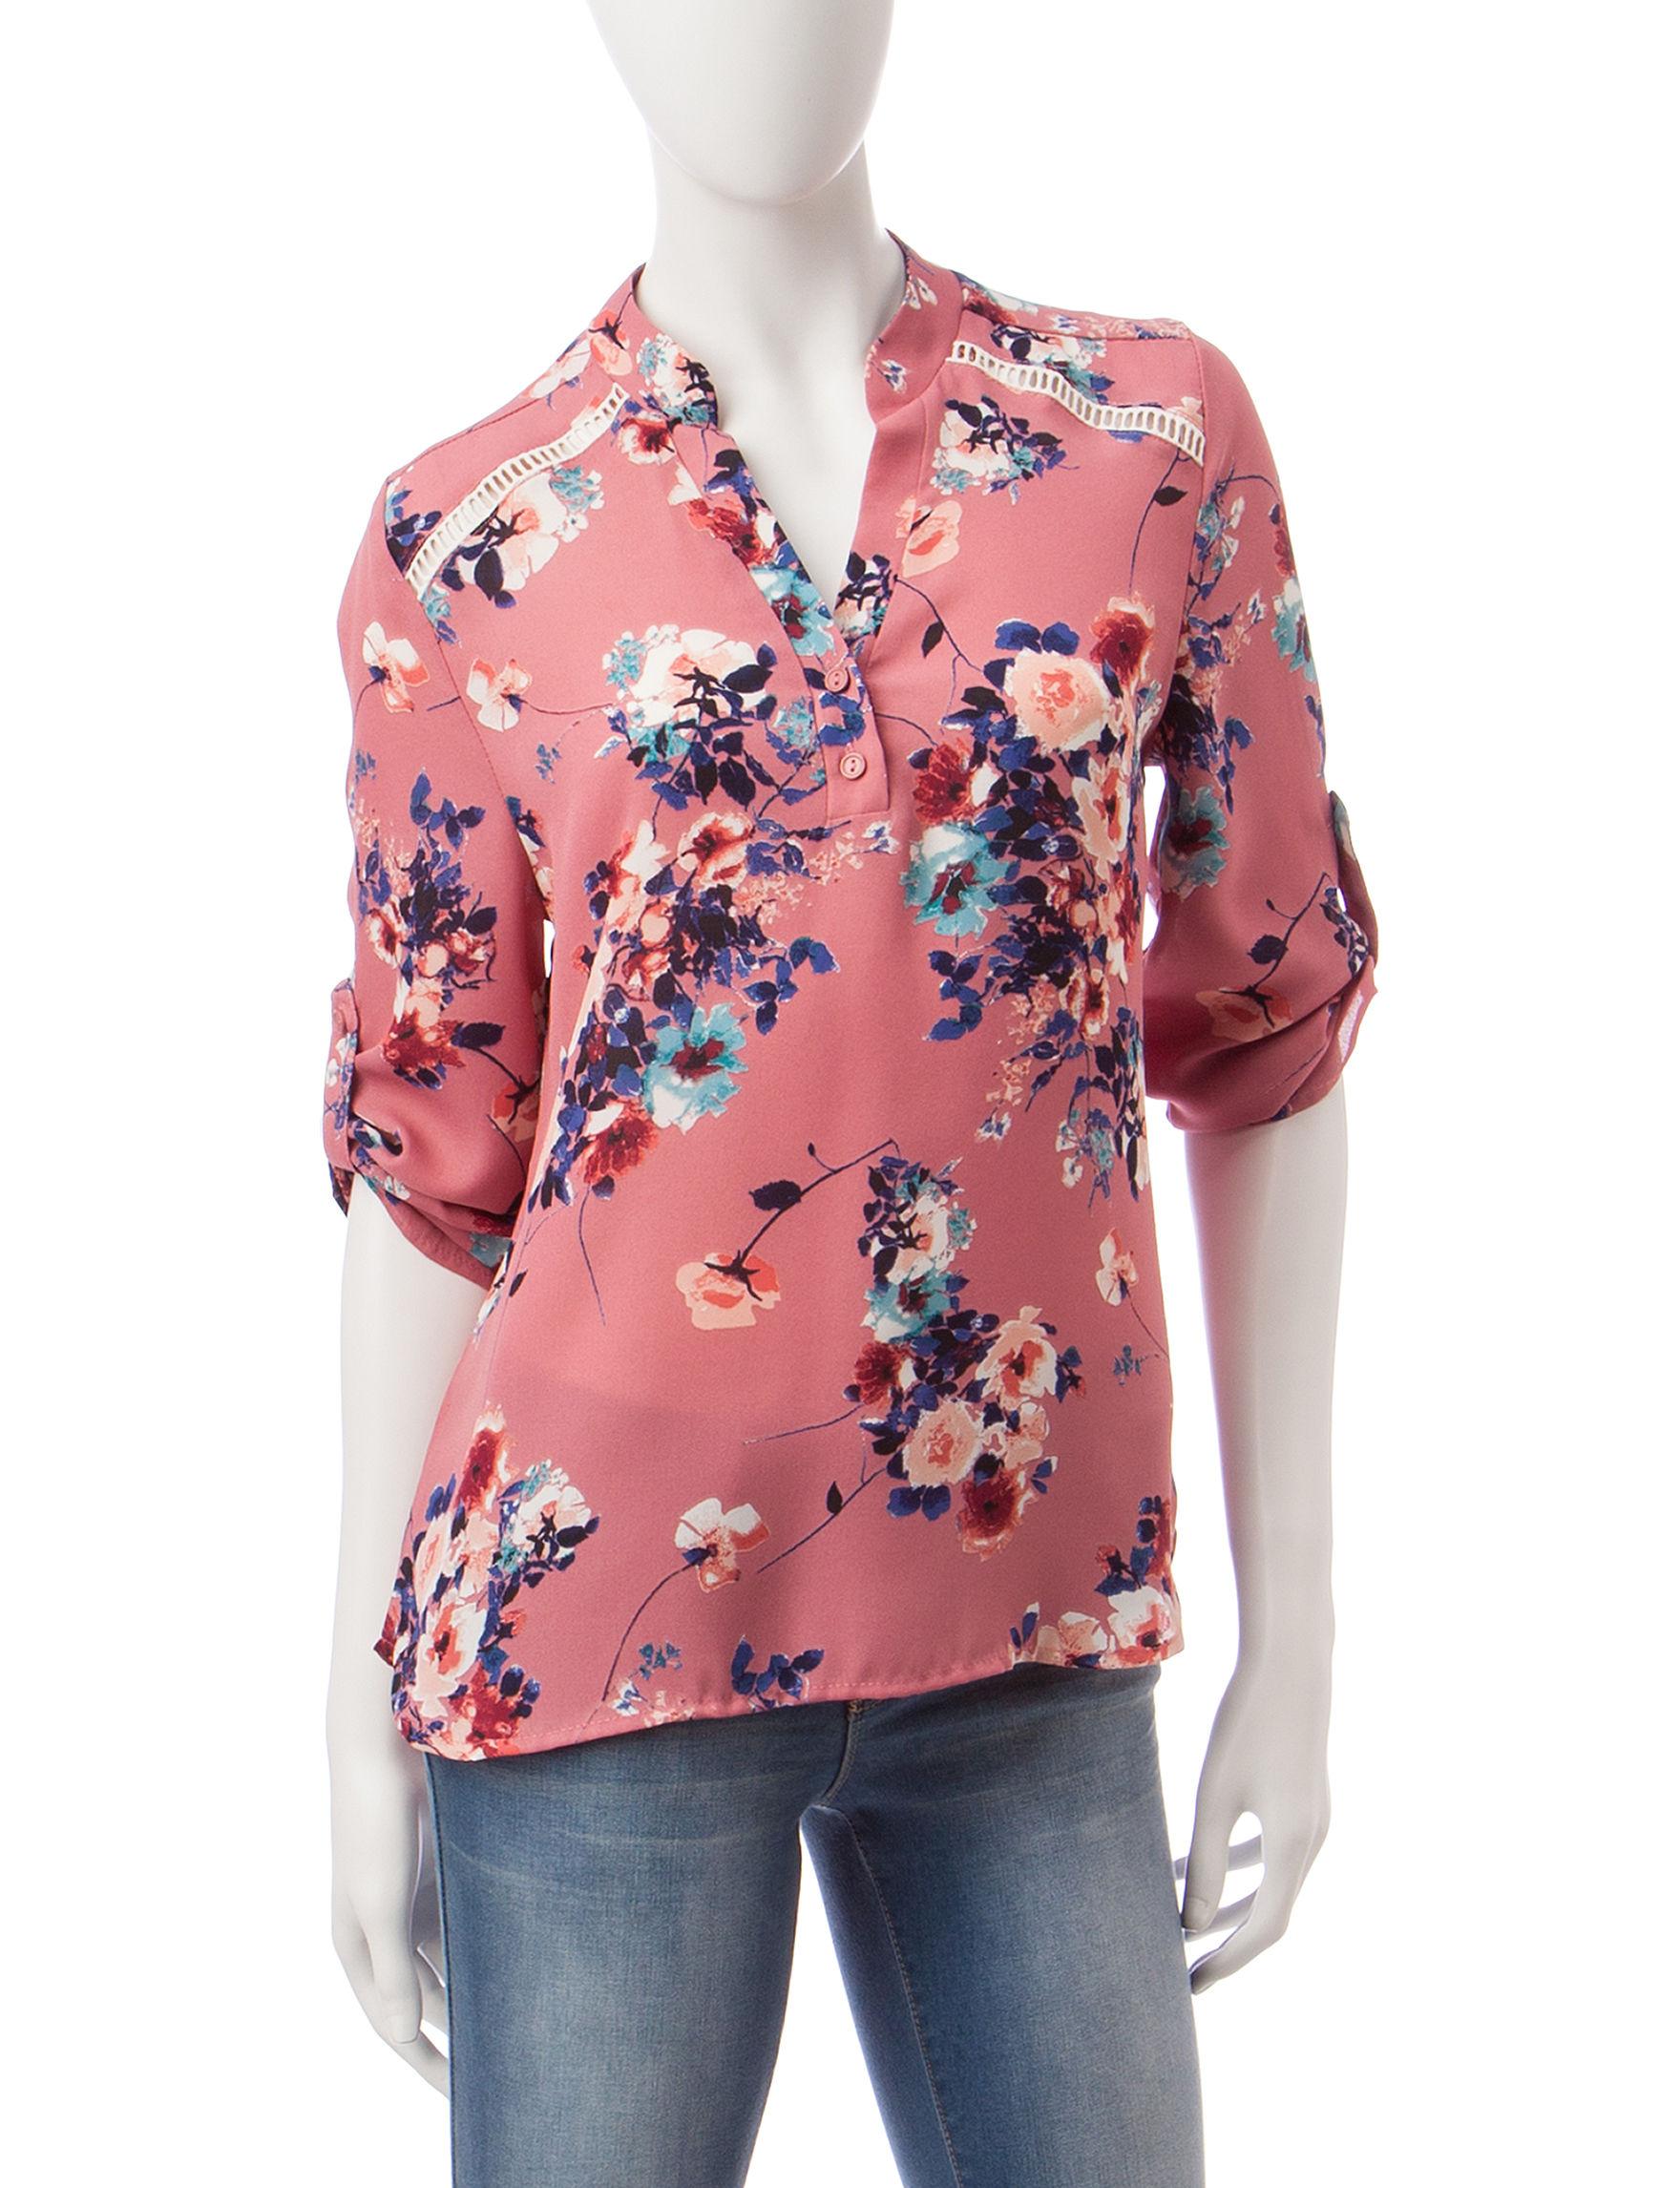 Wishful Park Mauve Shirts & Blouses